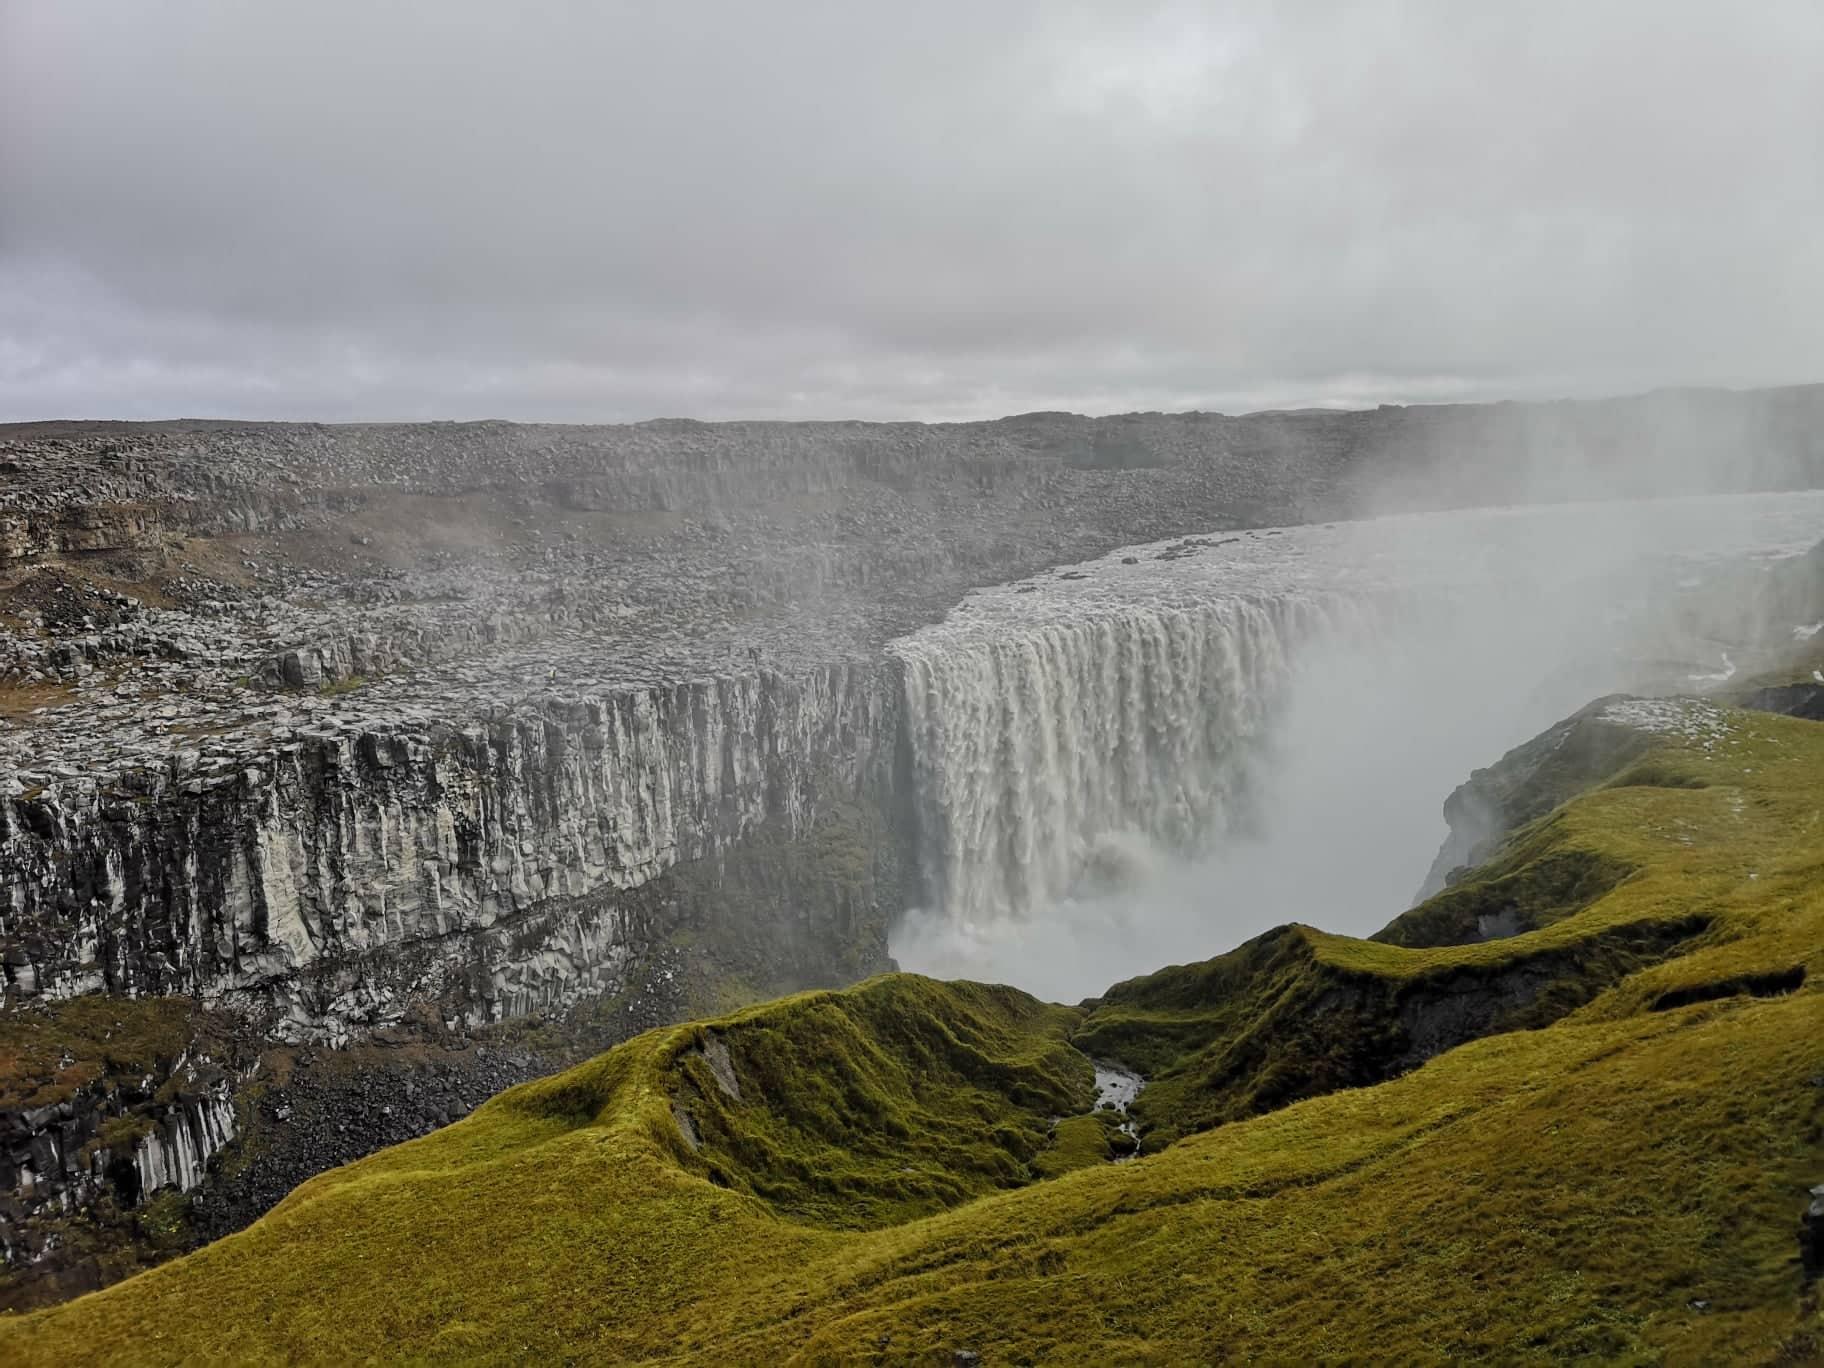 La puissante cascade de Dettifoss dans le nord de l'Islande